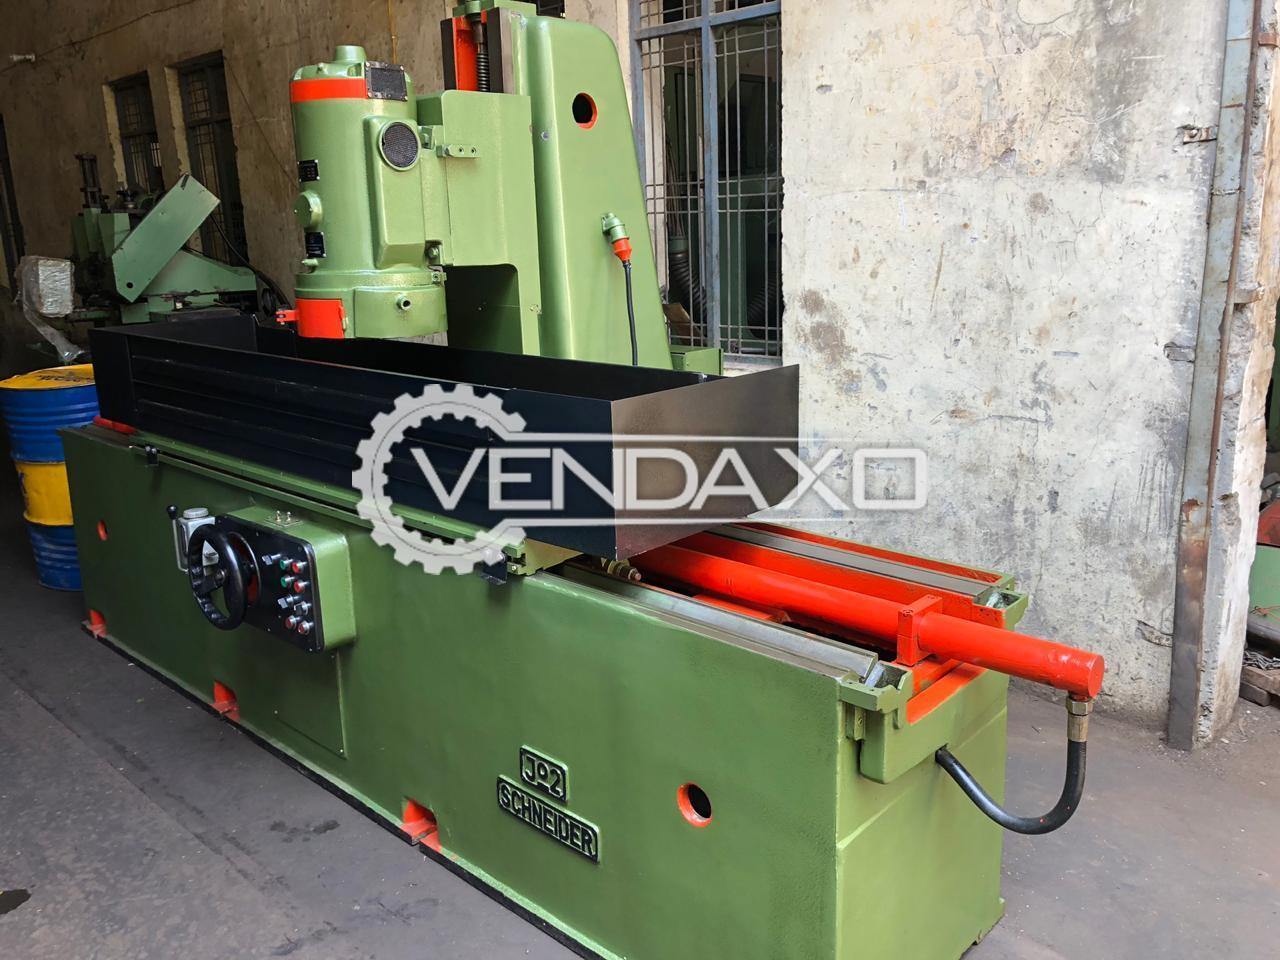 Schneider Make Cup Grinding Machine - Table Size : 1200 x 300 mm